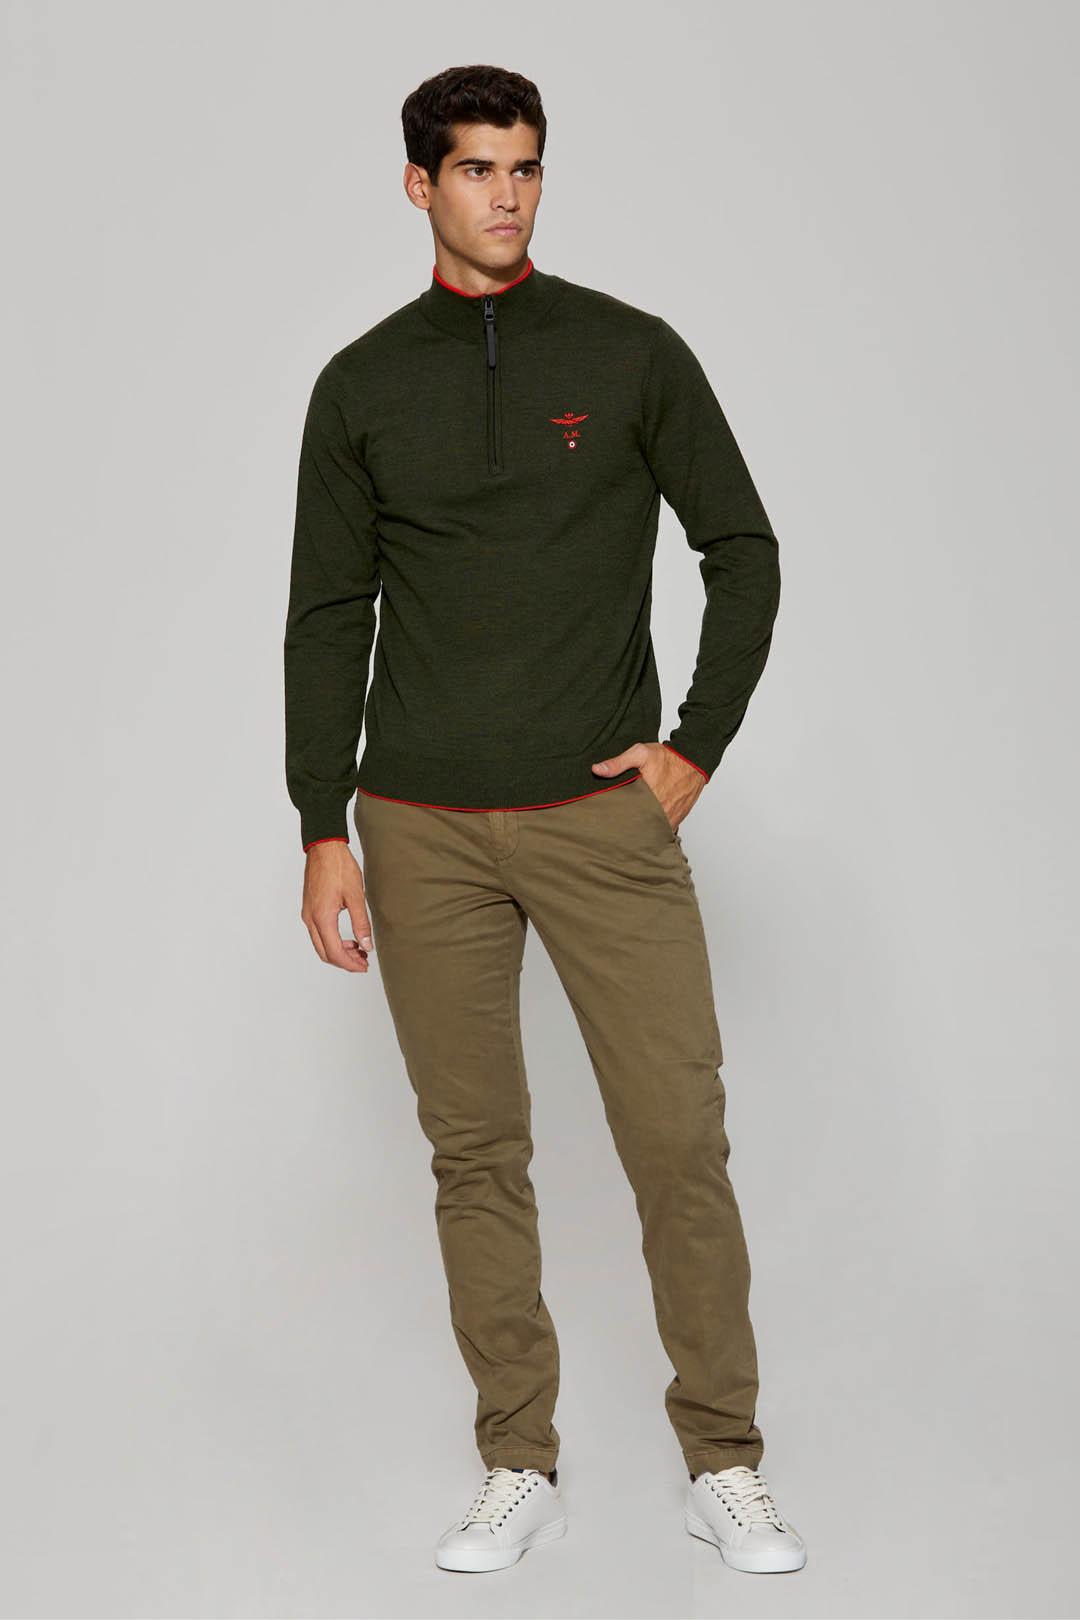 Pullover aus Merino Wolle                4